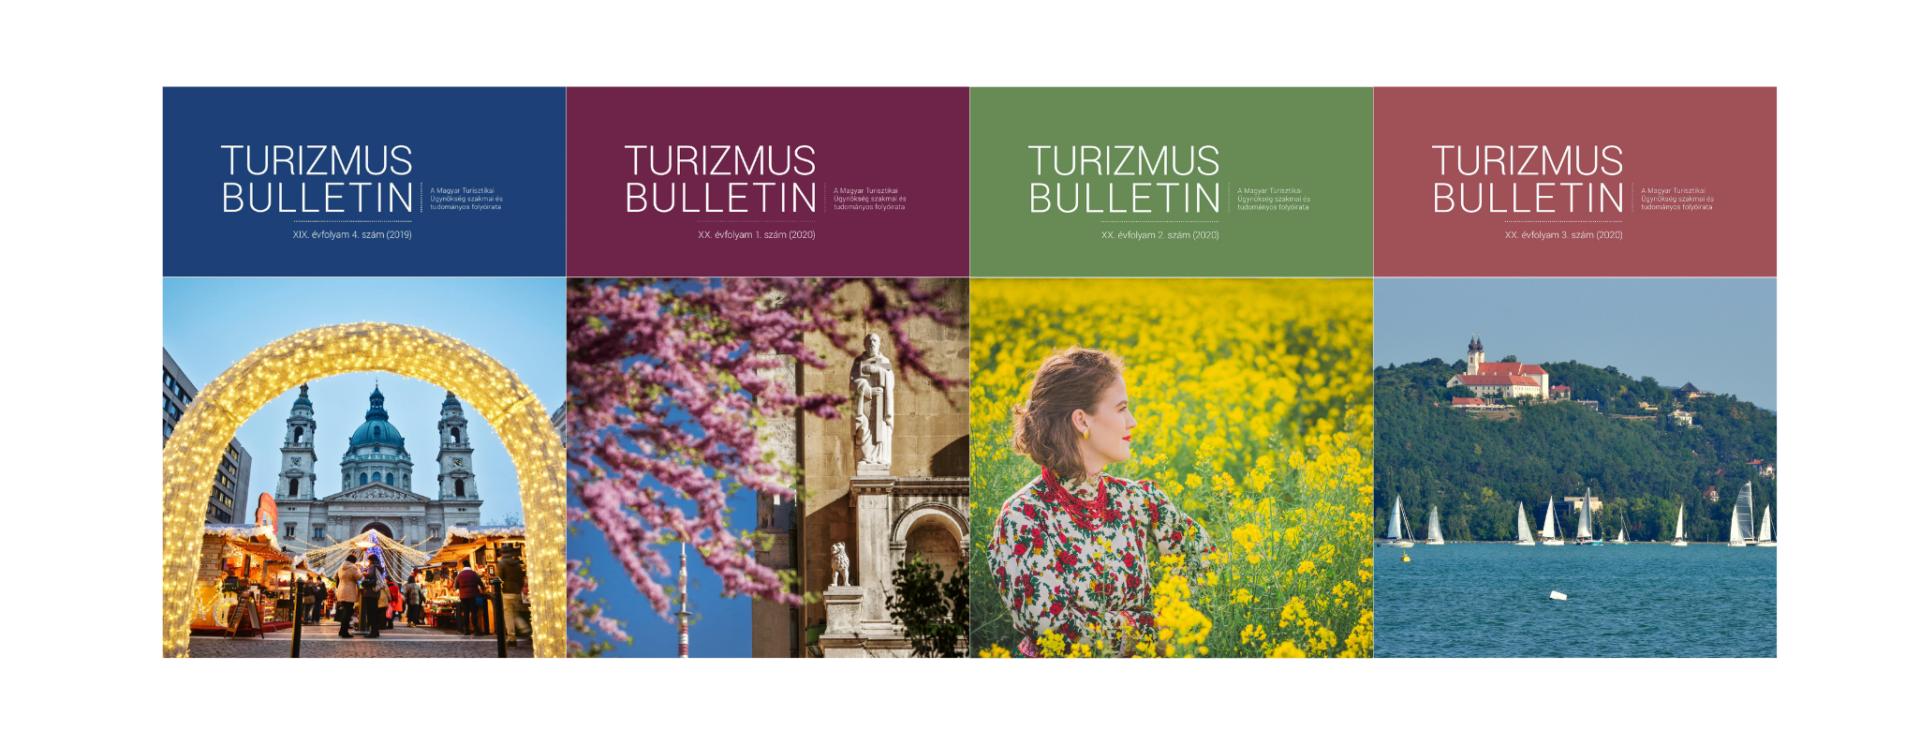 Turizmus Bulletin TTK Corvinus